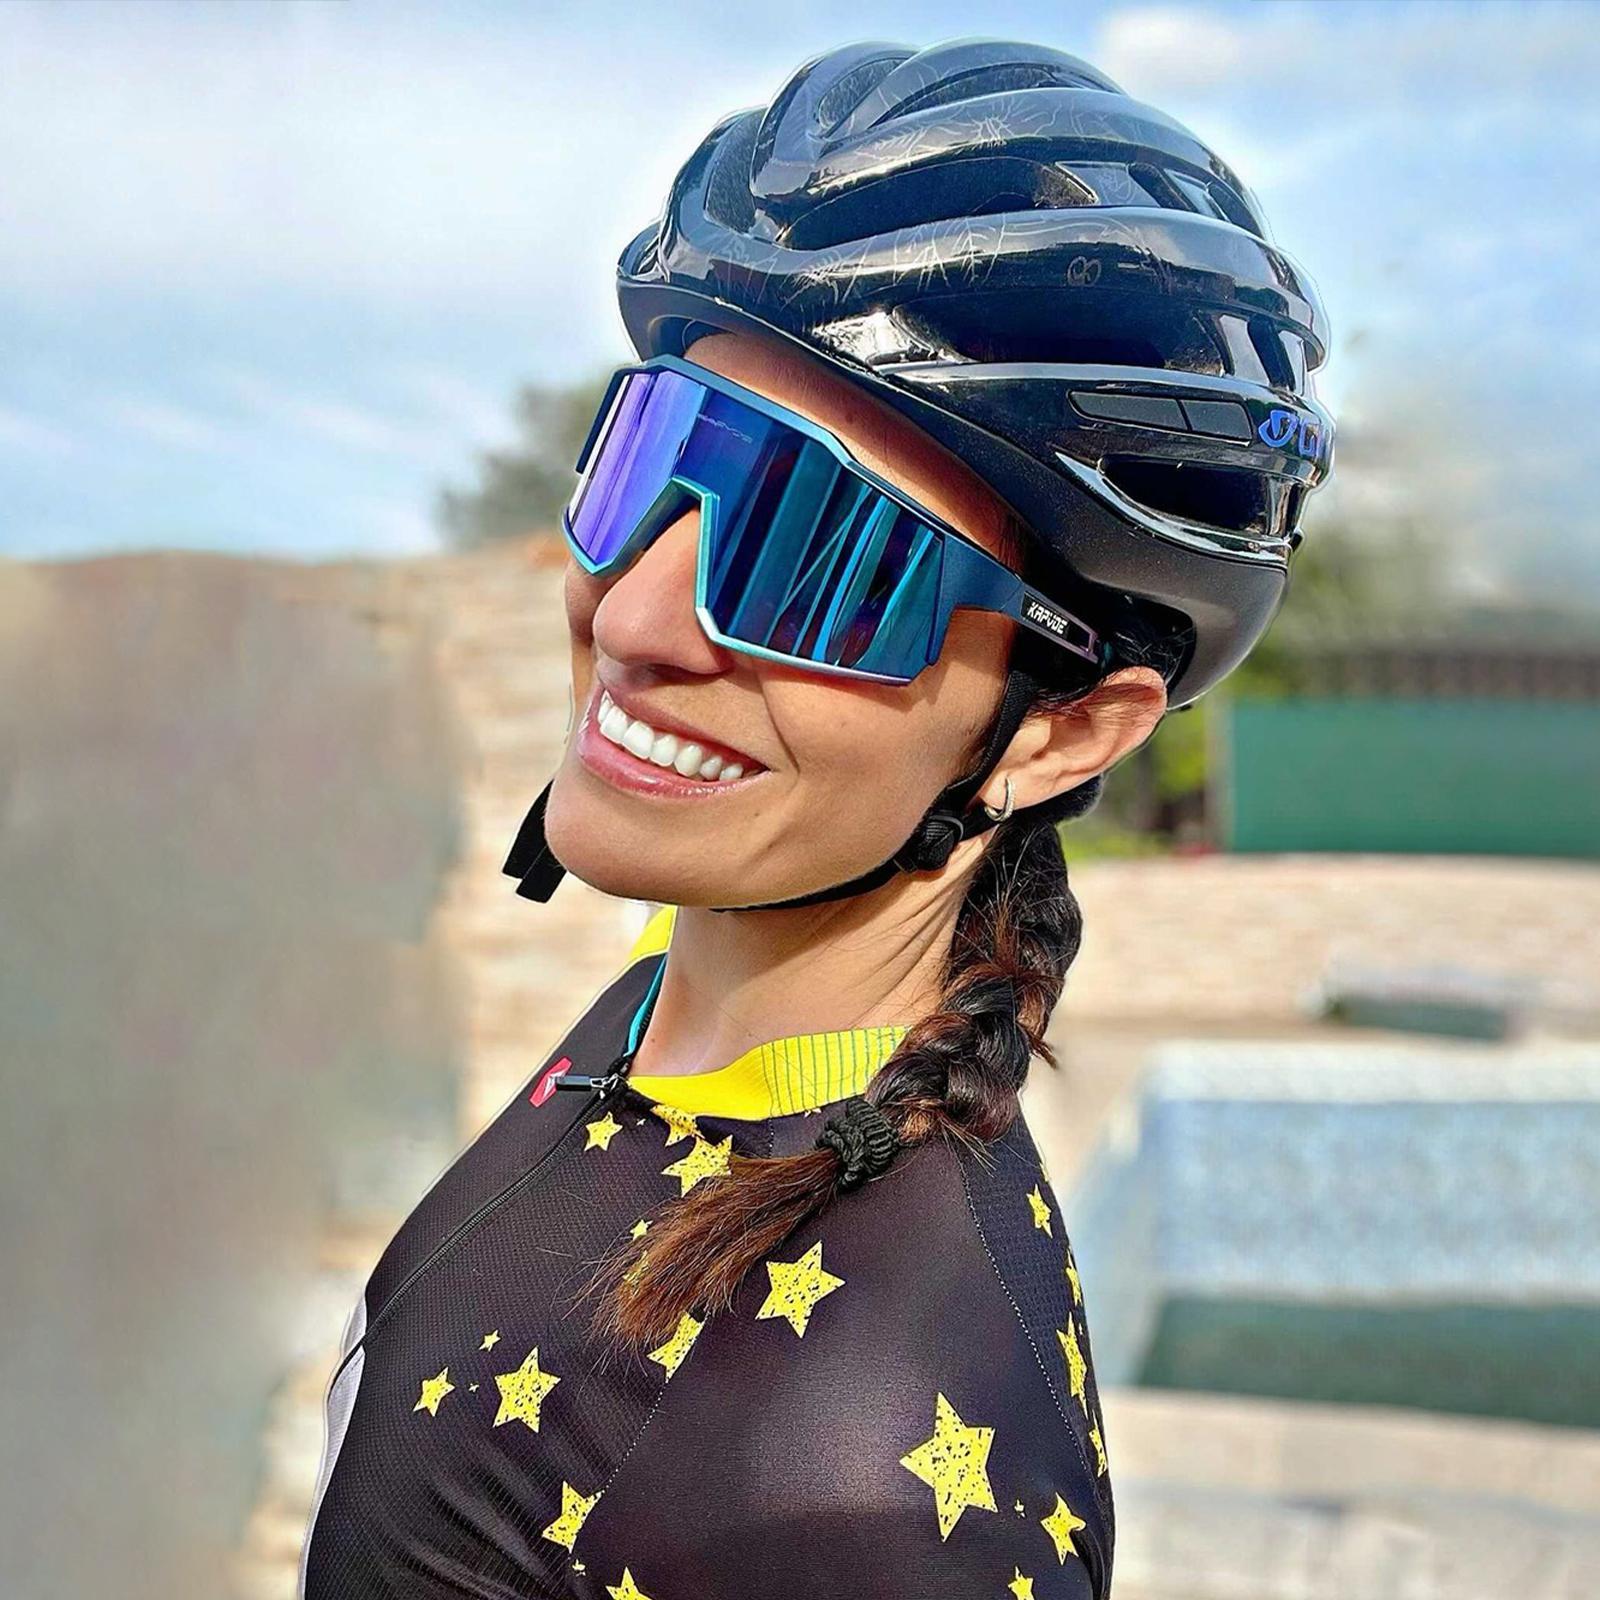 Kapvoe 사이클링 안경 도로 사이클링 고글 야외 UV400 사이클 선글라스 스포츠 보호 MTB 도로 산악 자전거 안경